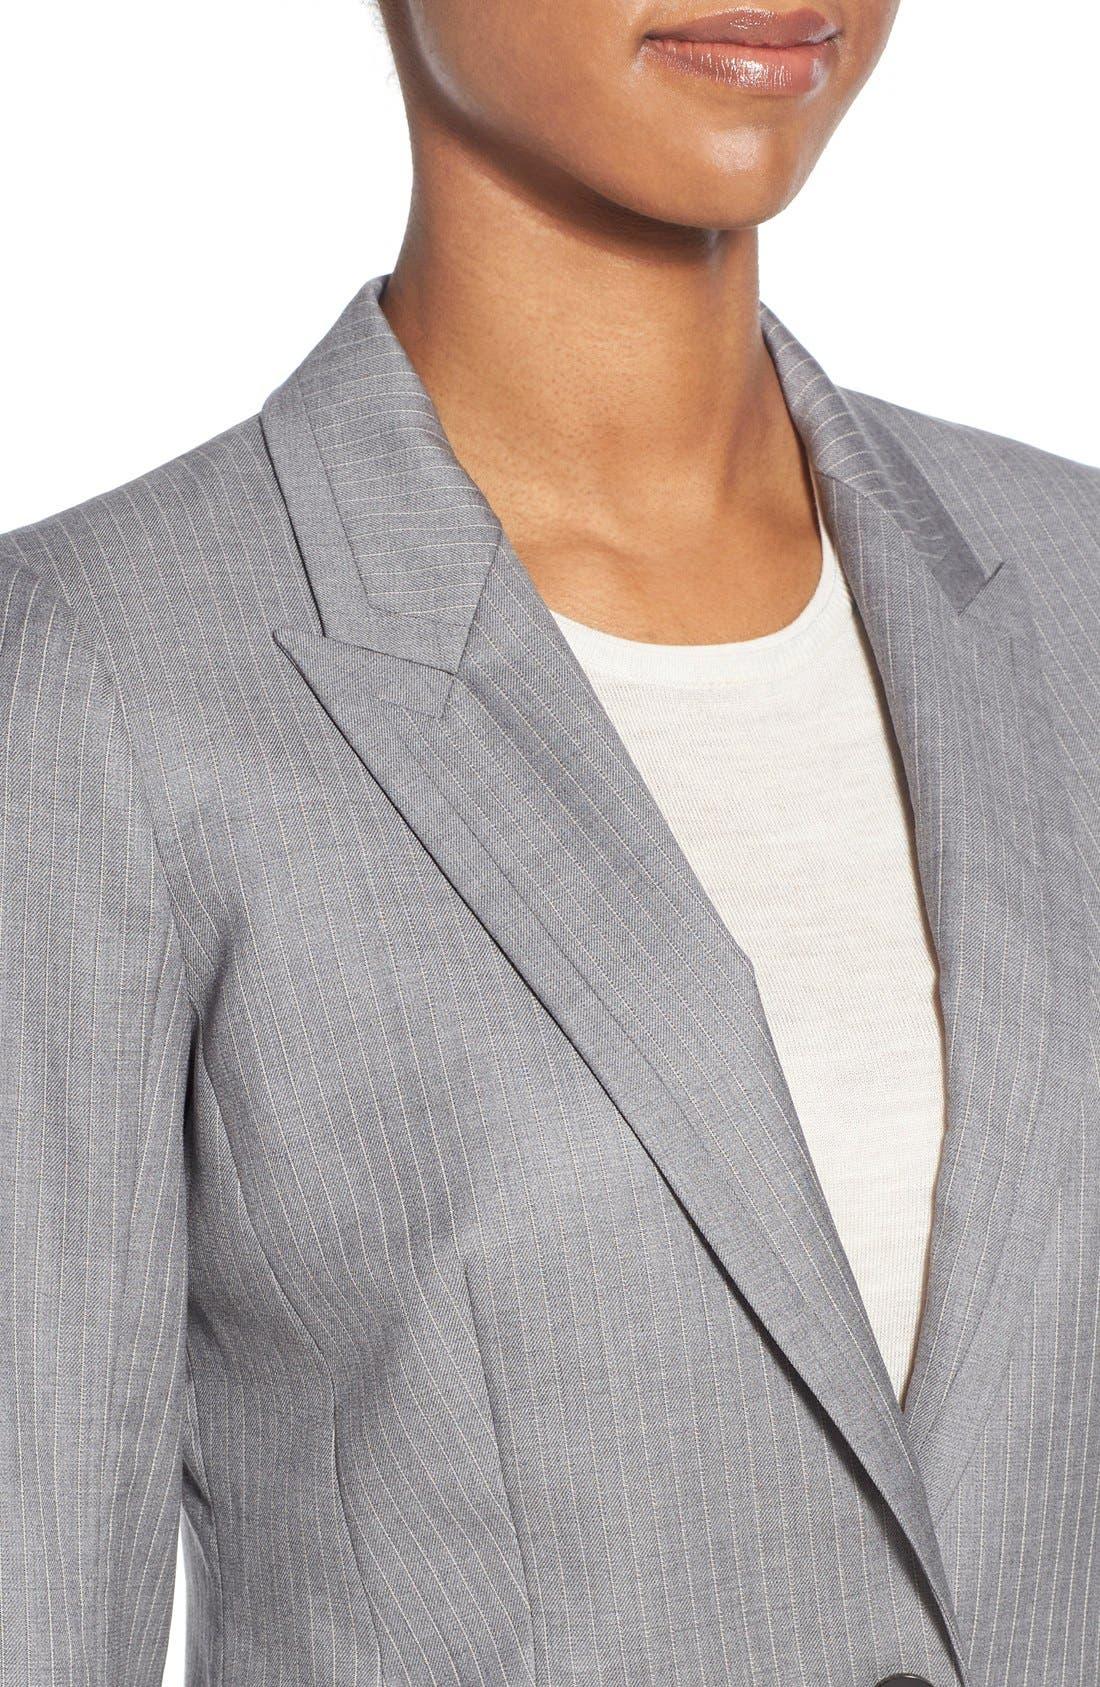 'Jelenna' Pinstripe One-Button Suit Jacket,                             Alternate thumbnail 6, color,                             060